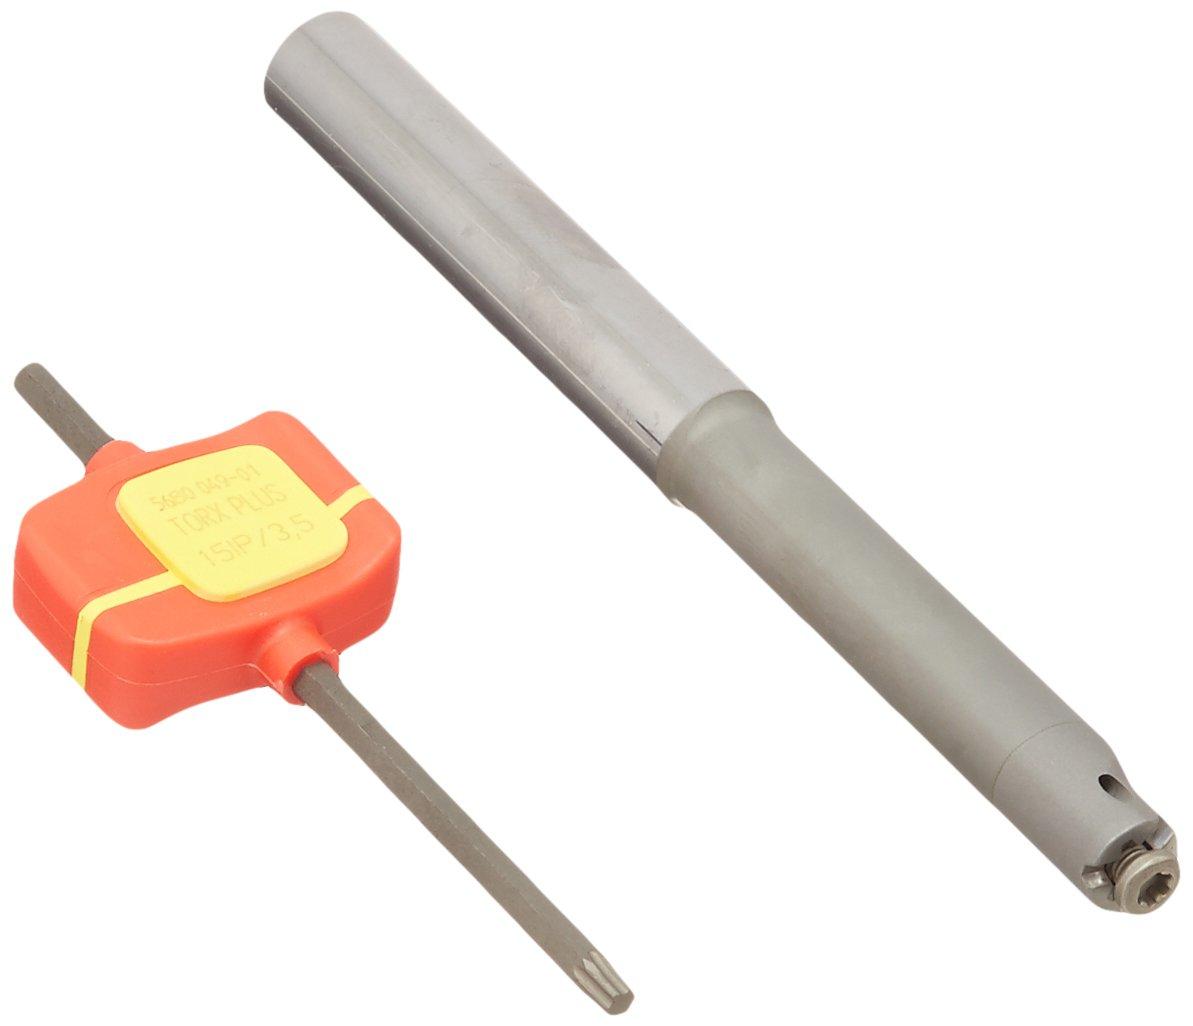 Sandvik Coromant MB-E12-64-09R Carbide Cylindrical Shank to CoroCut MB Adaptor 12 mm Shank Diameter 0.08 Maximum Depth of Cut